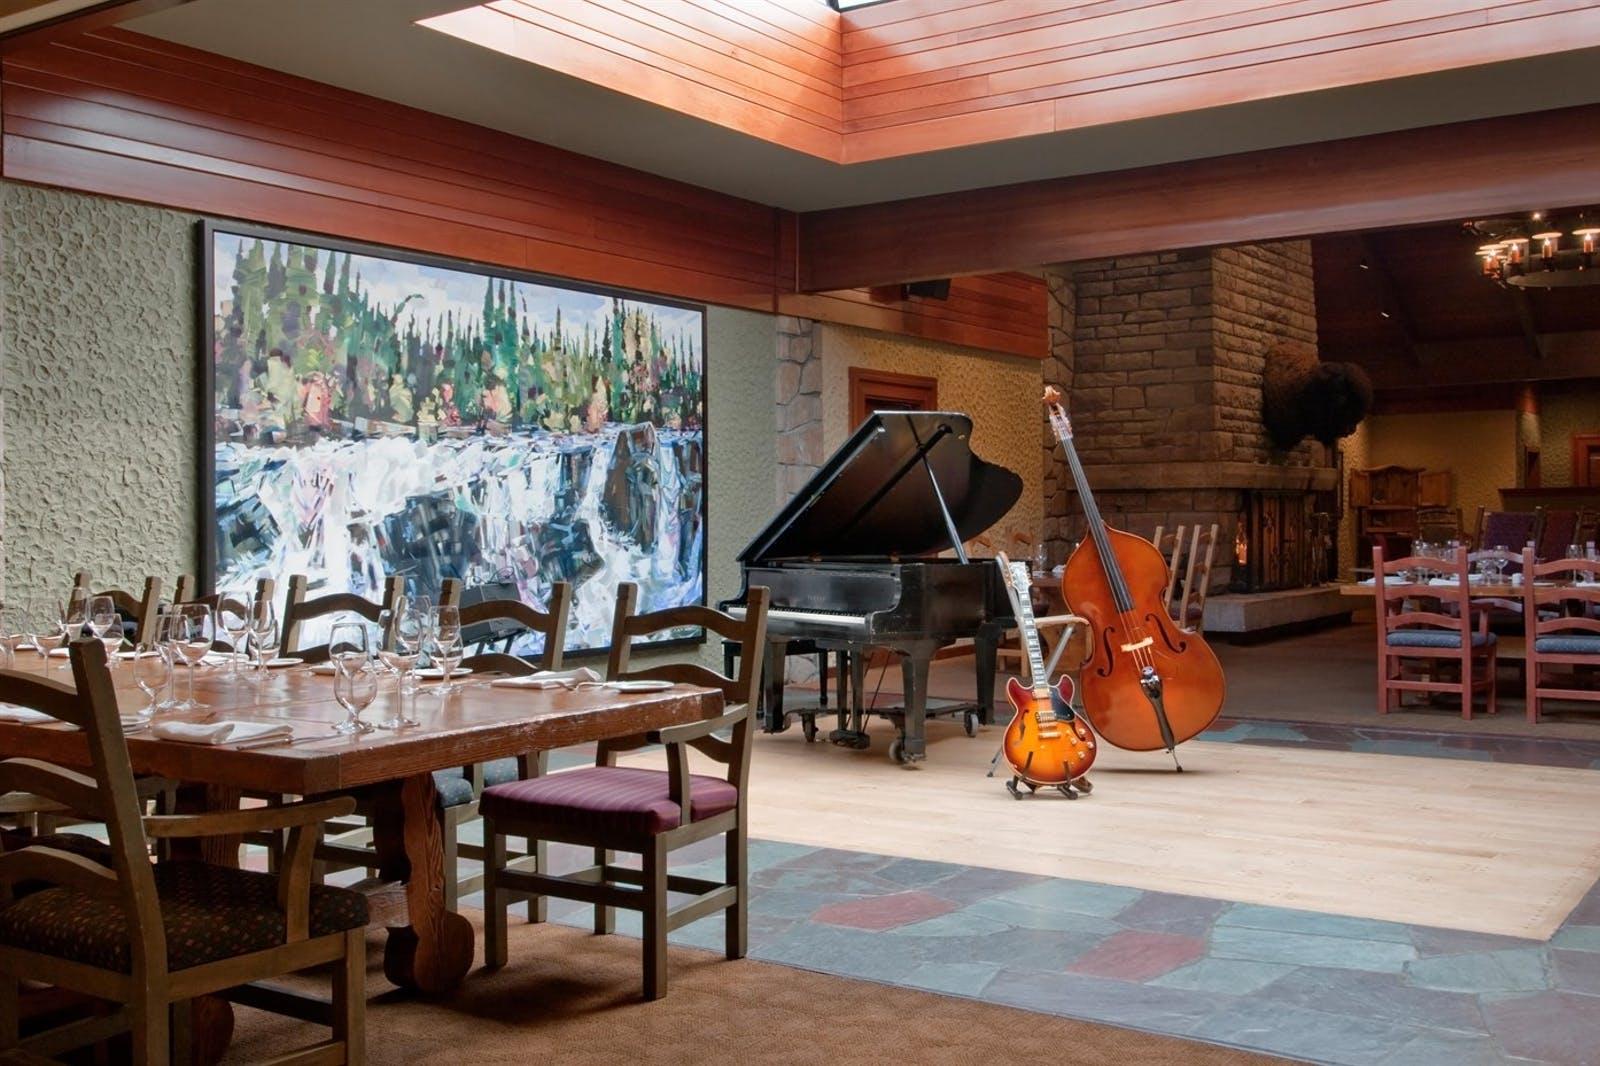 fairmont jasper park lodge alberta world renowned. Black Bedroom Furniture Sets. Home Design Ideas